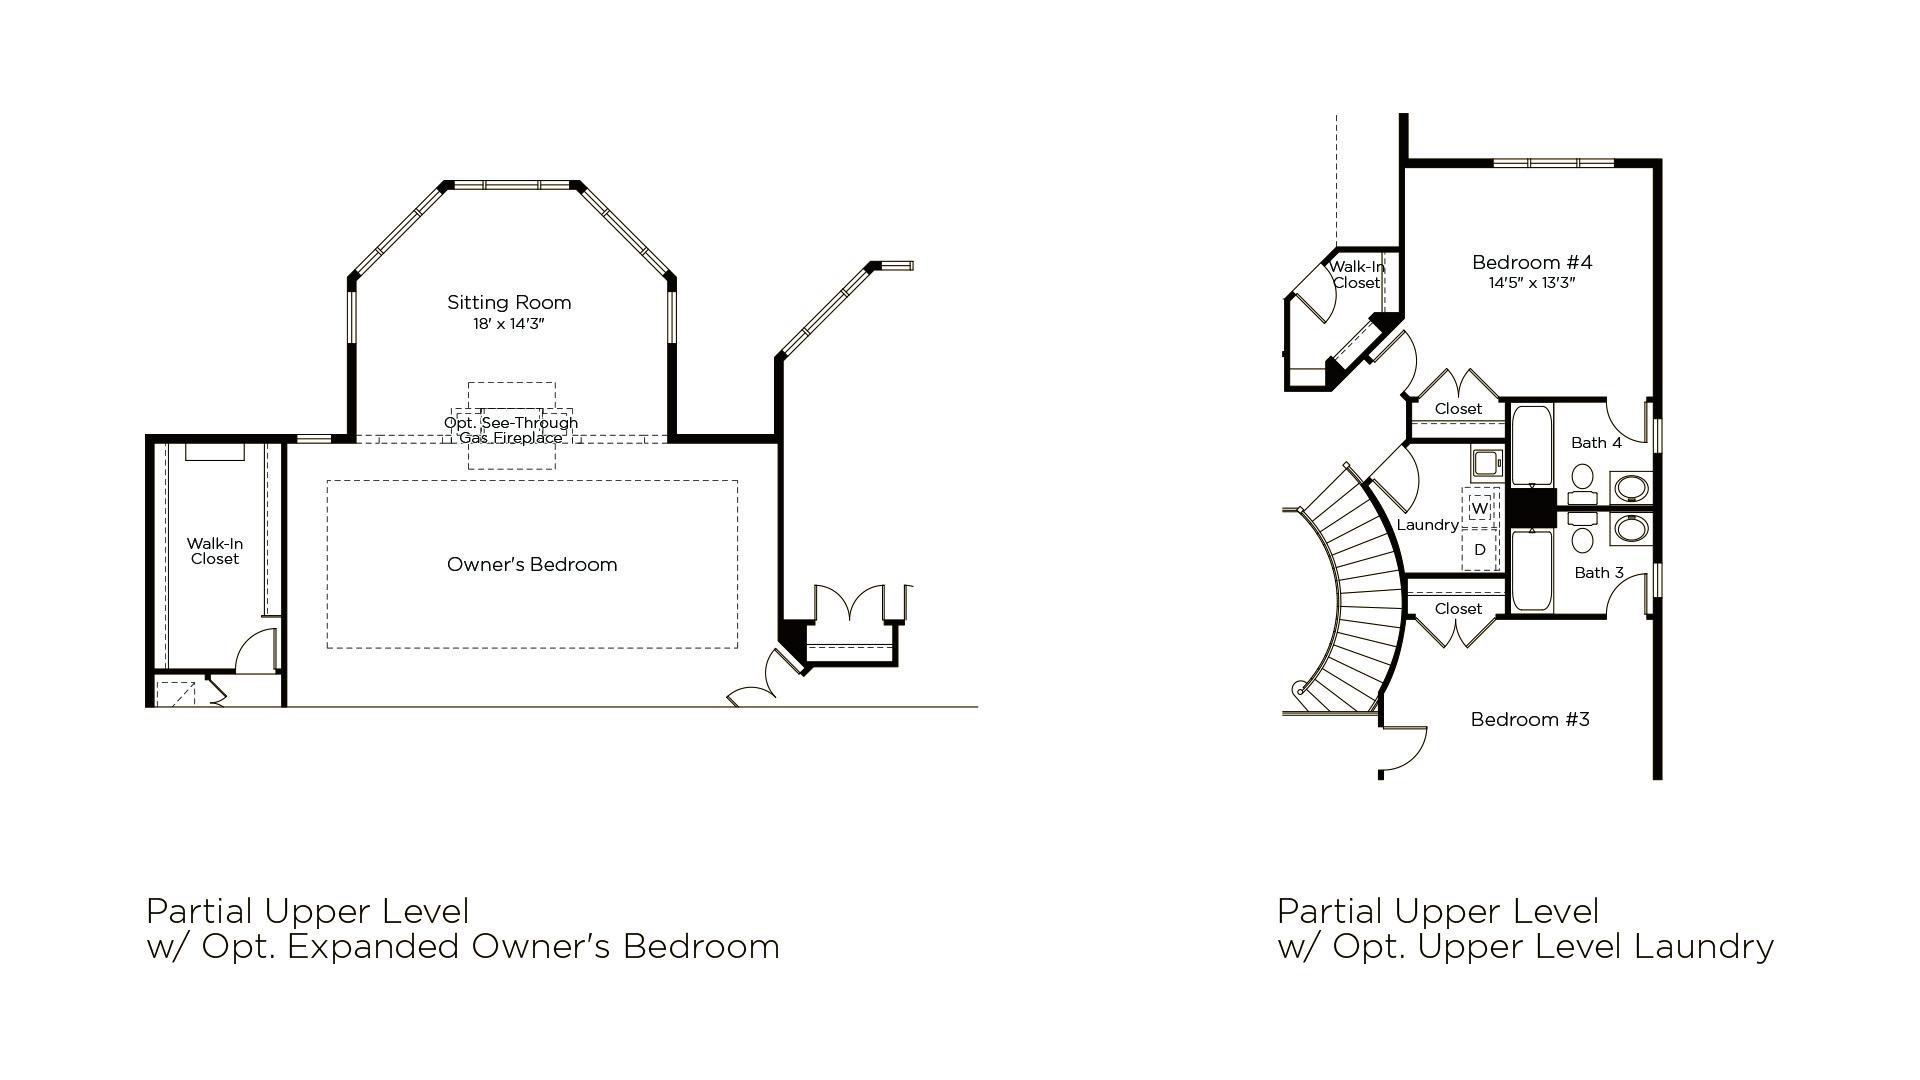 Winthrop - Summerwood Series - Optional Upper Level Features